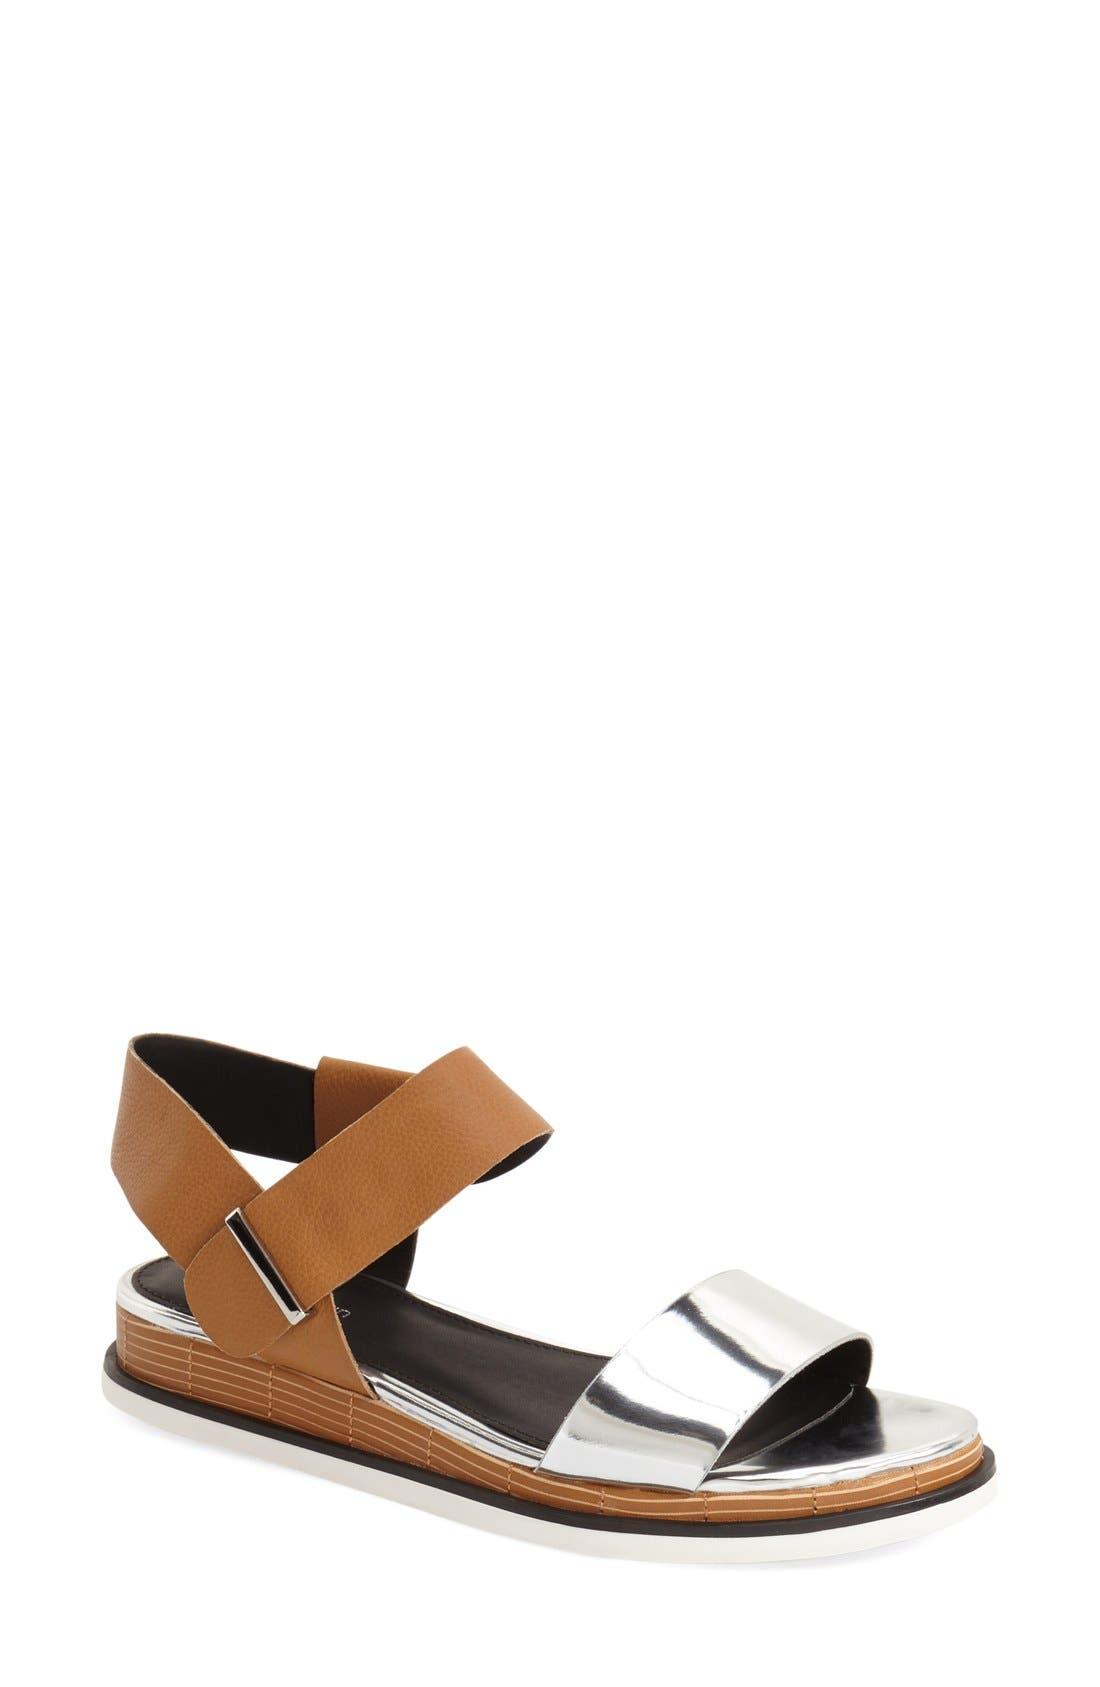 Alternate Image 1 Selected - Calvin Klein 'Cadan' Demi Wedge Sandal (Women)